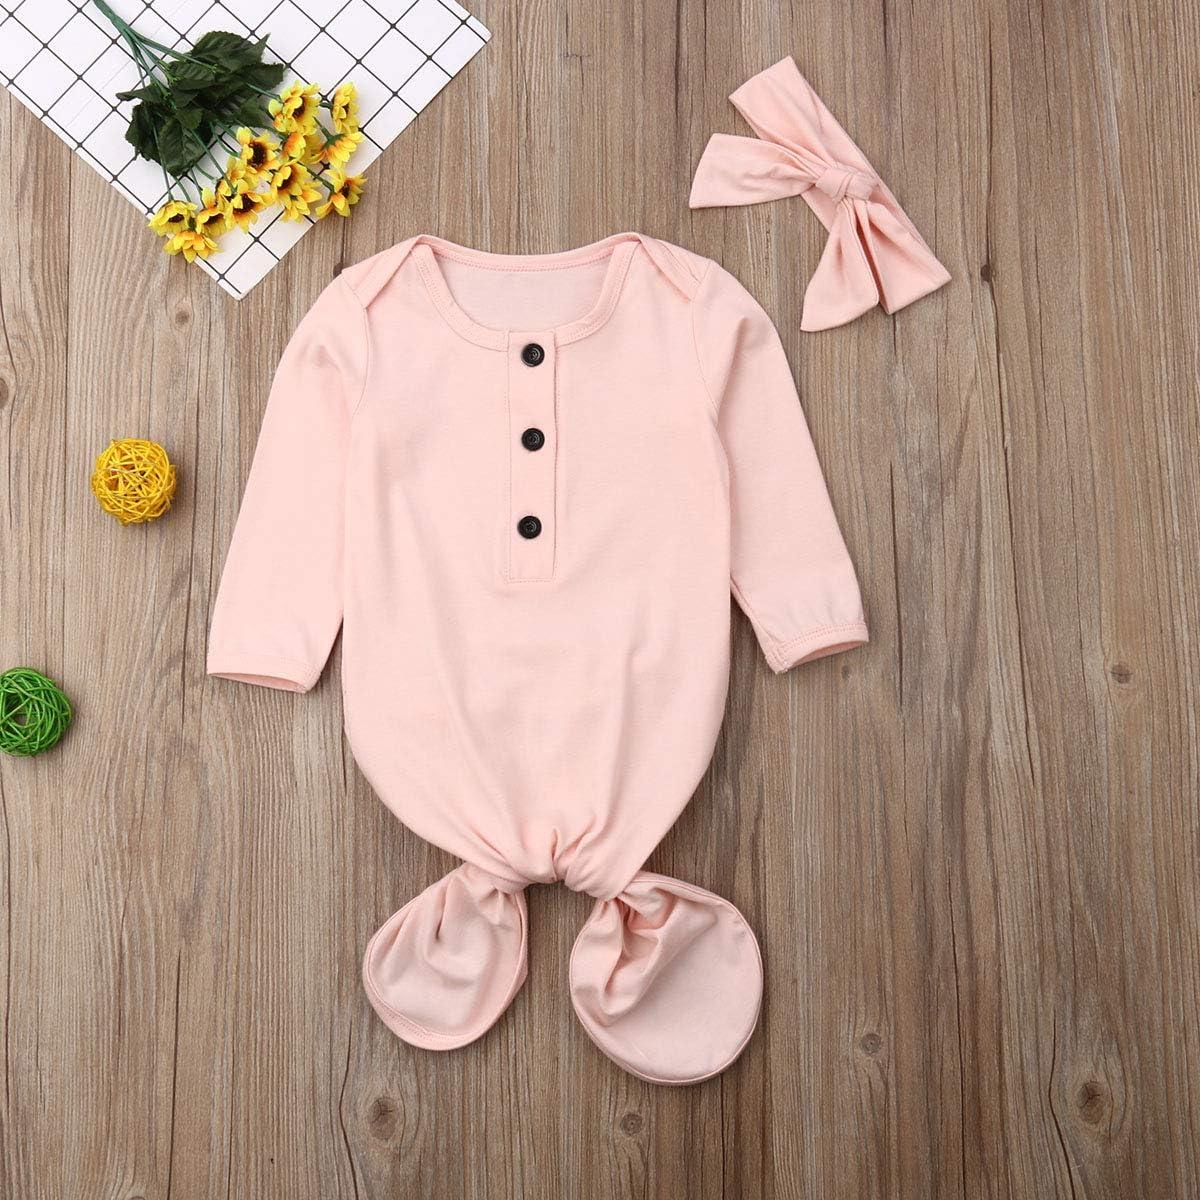 GuliriFei Unisex Newborn Baby Sleepwear Nightgown Striped Cotton Sleeper Gowns Long Knotted Sleeping Bag